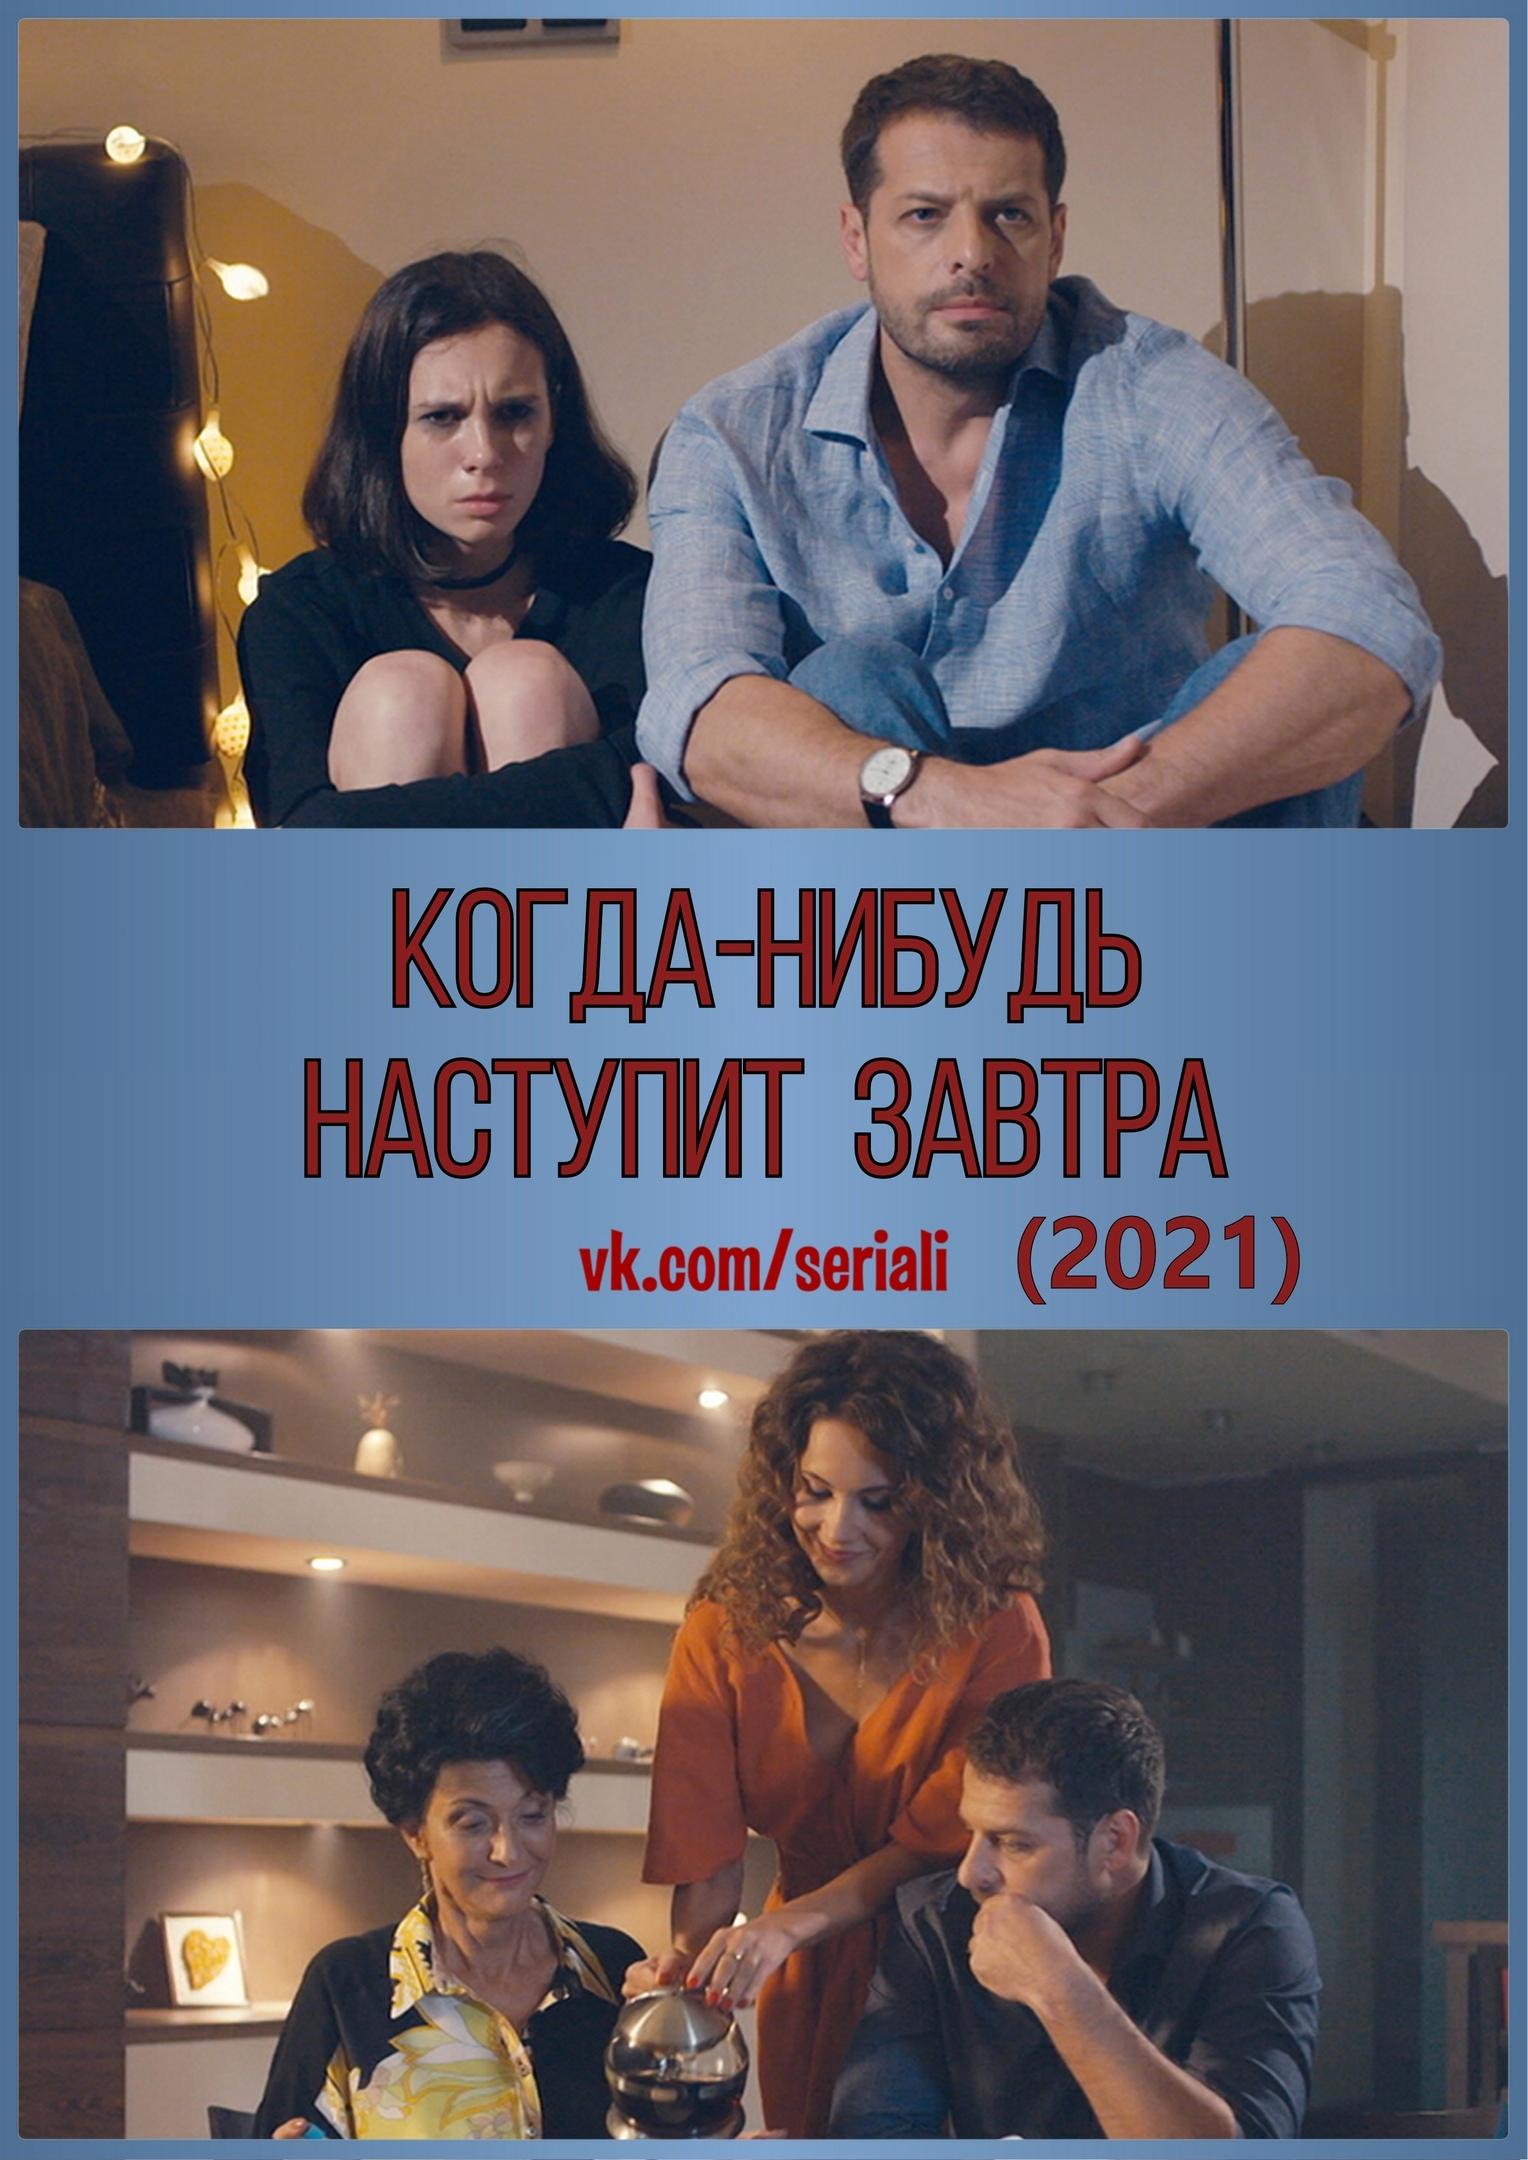 Детектив «Koгдa-нибyдь нacтyпит зaвтpa» (2021) 1-4 серия из 4 HD